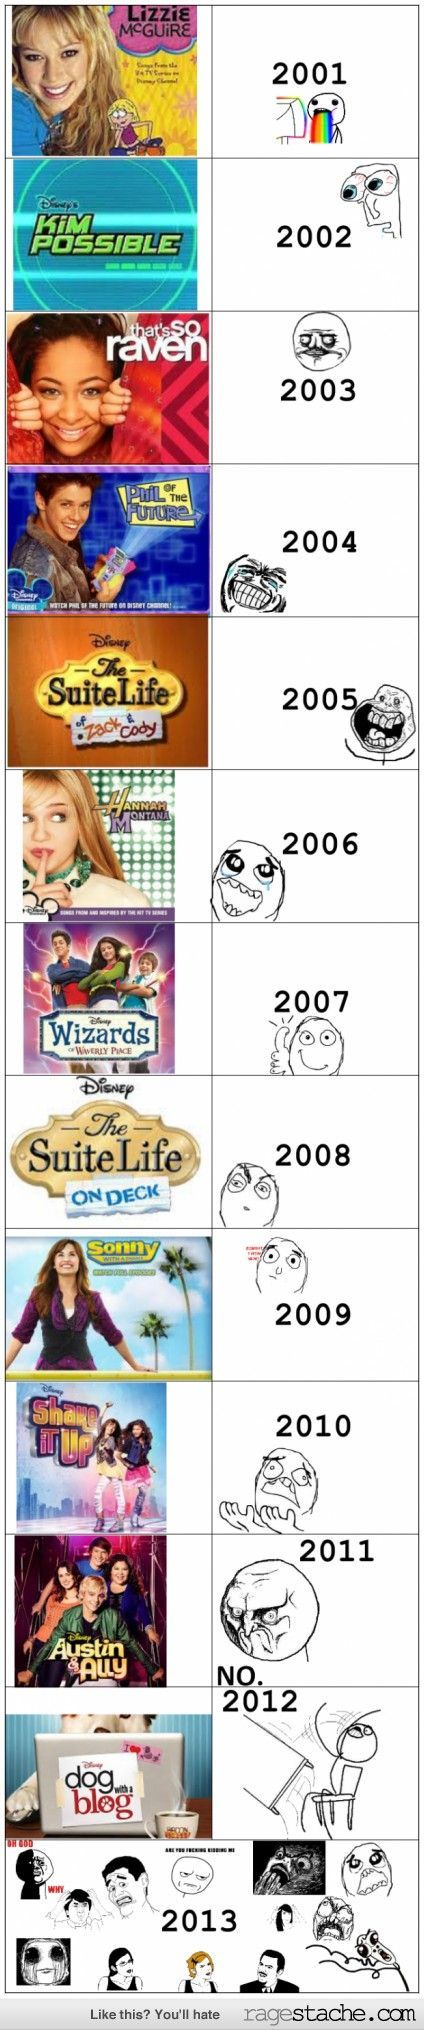 OMG for real! Bleh Disney shows, Old disney channel